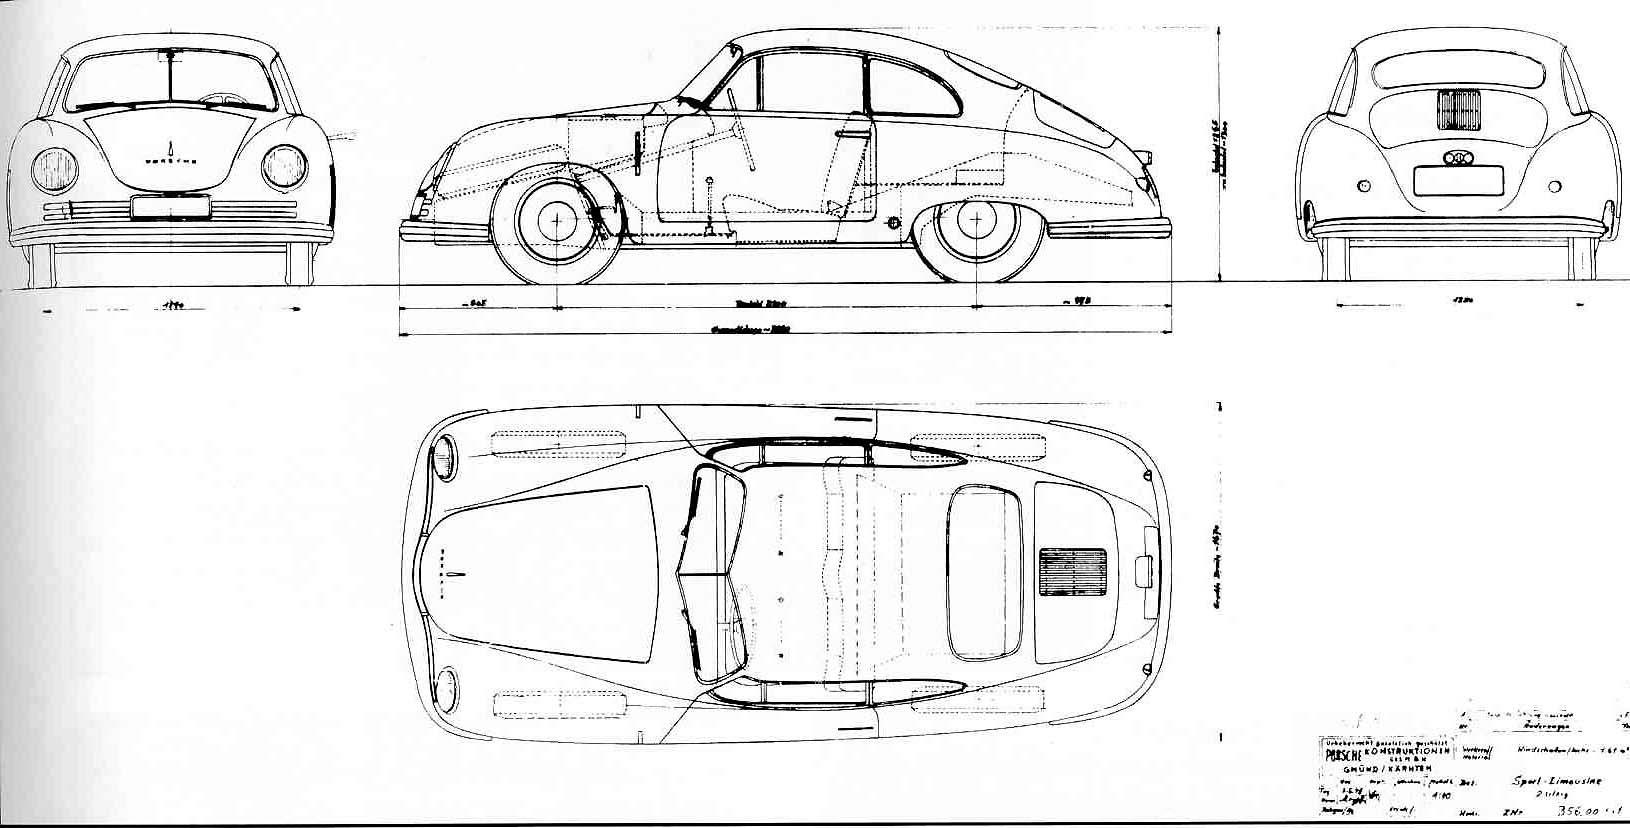 1948: 356 Coupe, Signature Ko (Komenda)